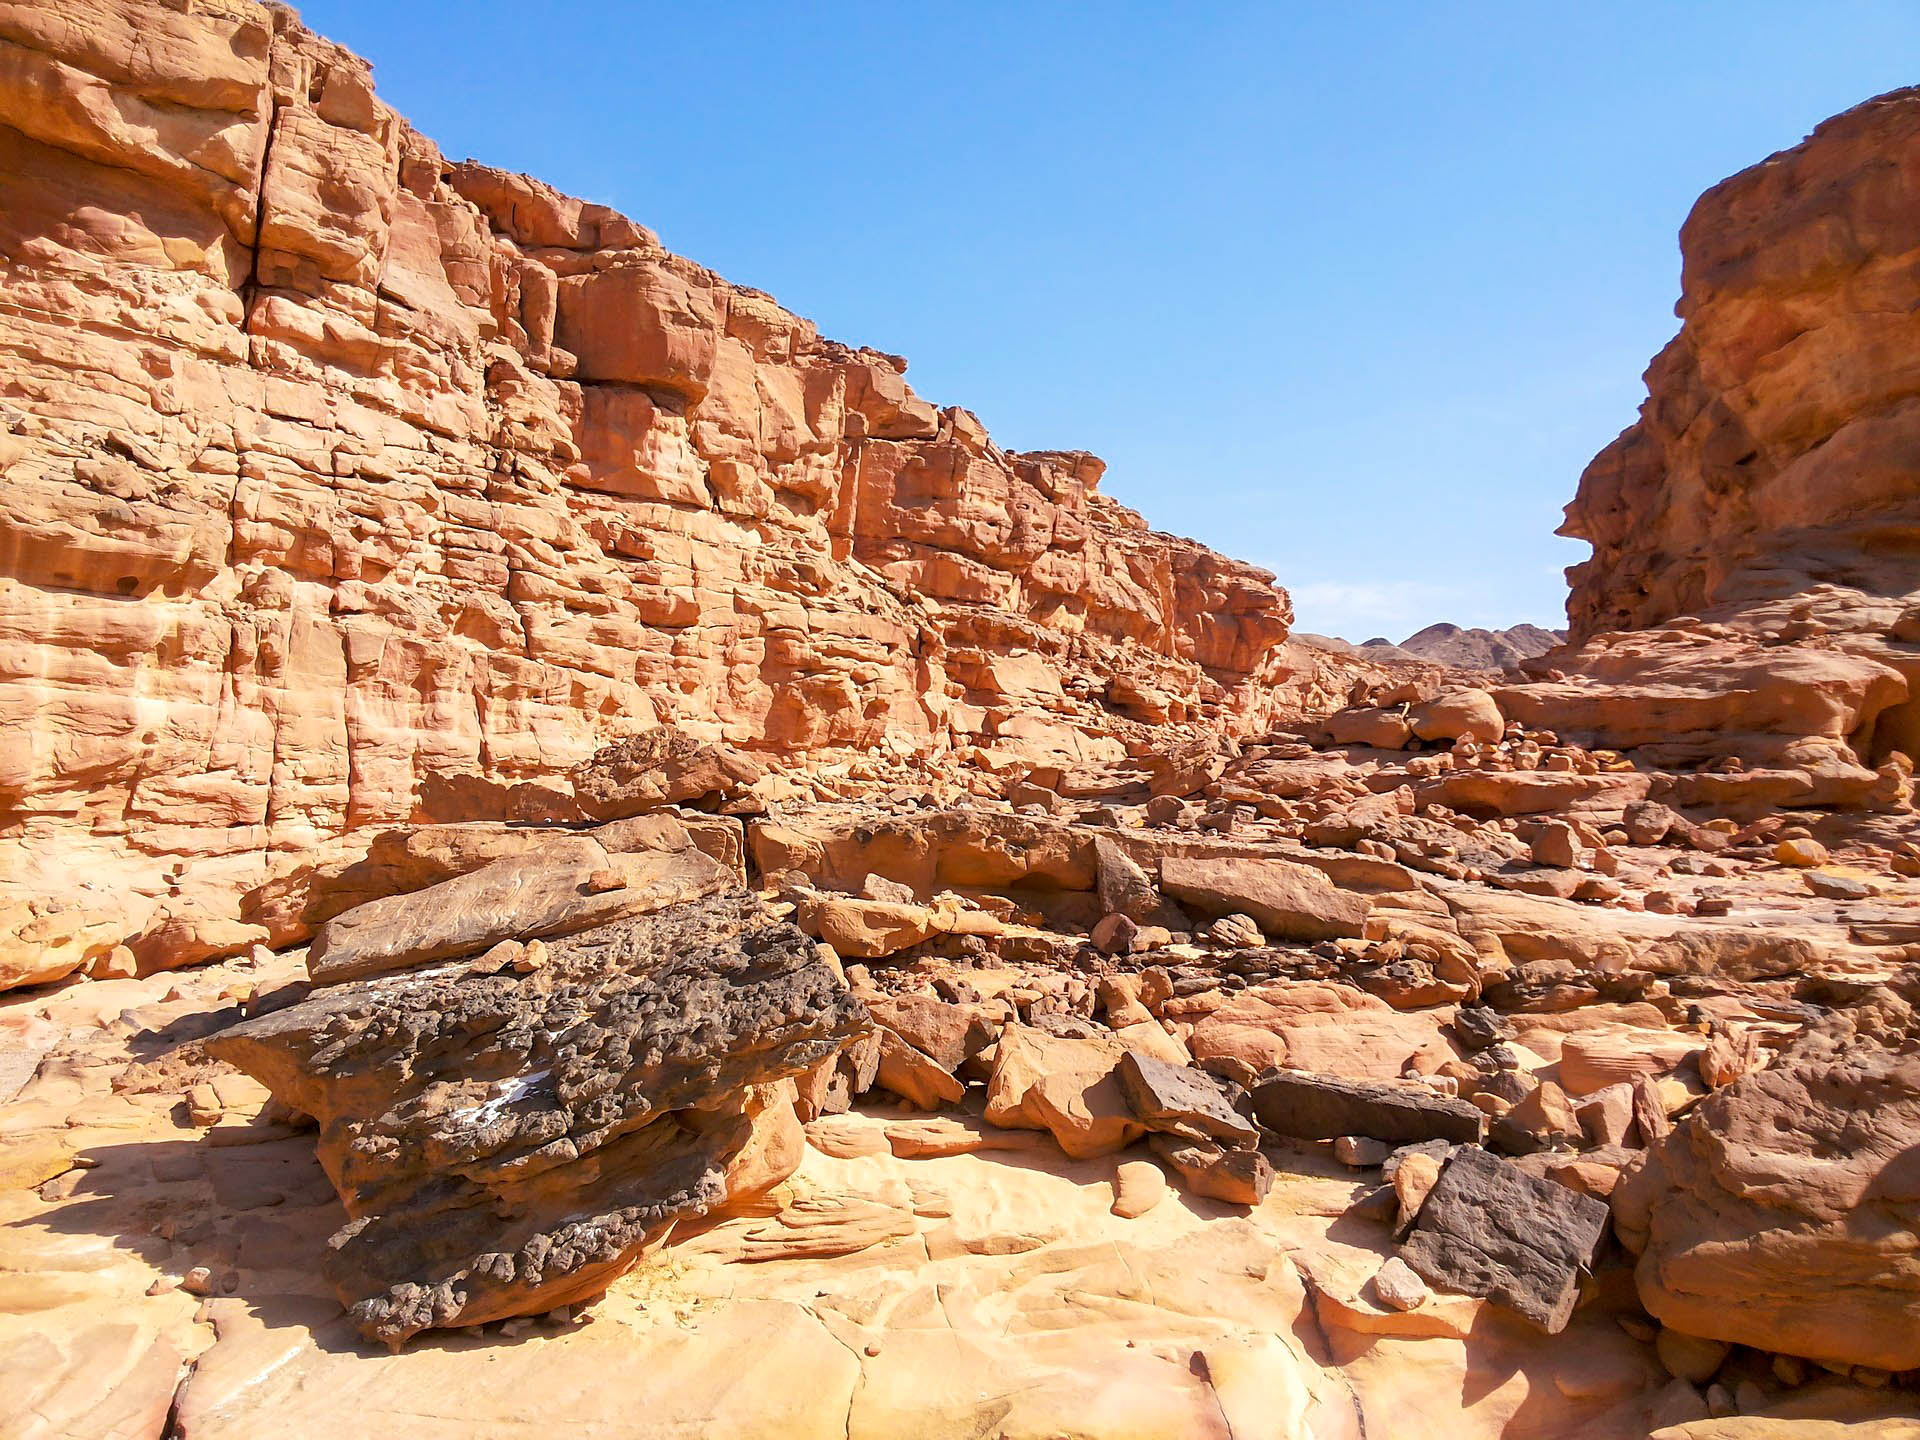 Єгипет Дахаб Кольоровий каньйон